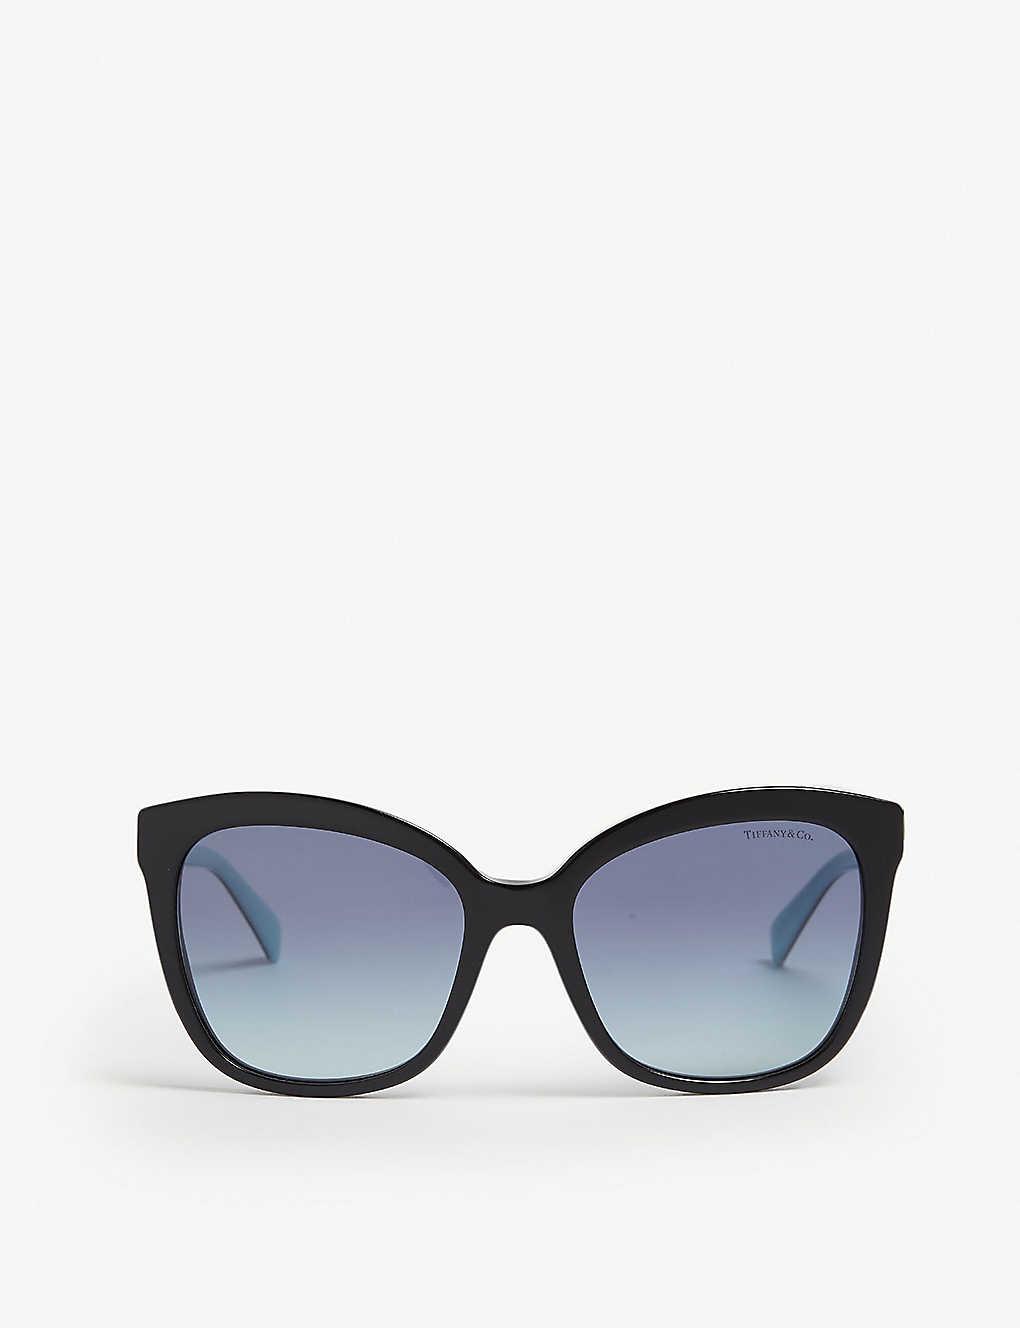 89f6ad9f189 TIFFANY   CO - Tf4150 square-frame sunglasses